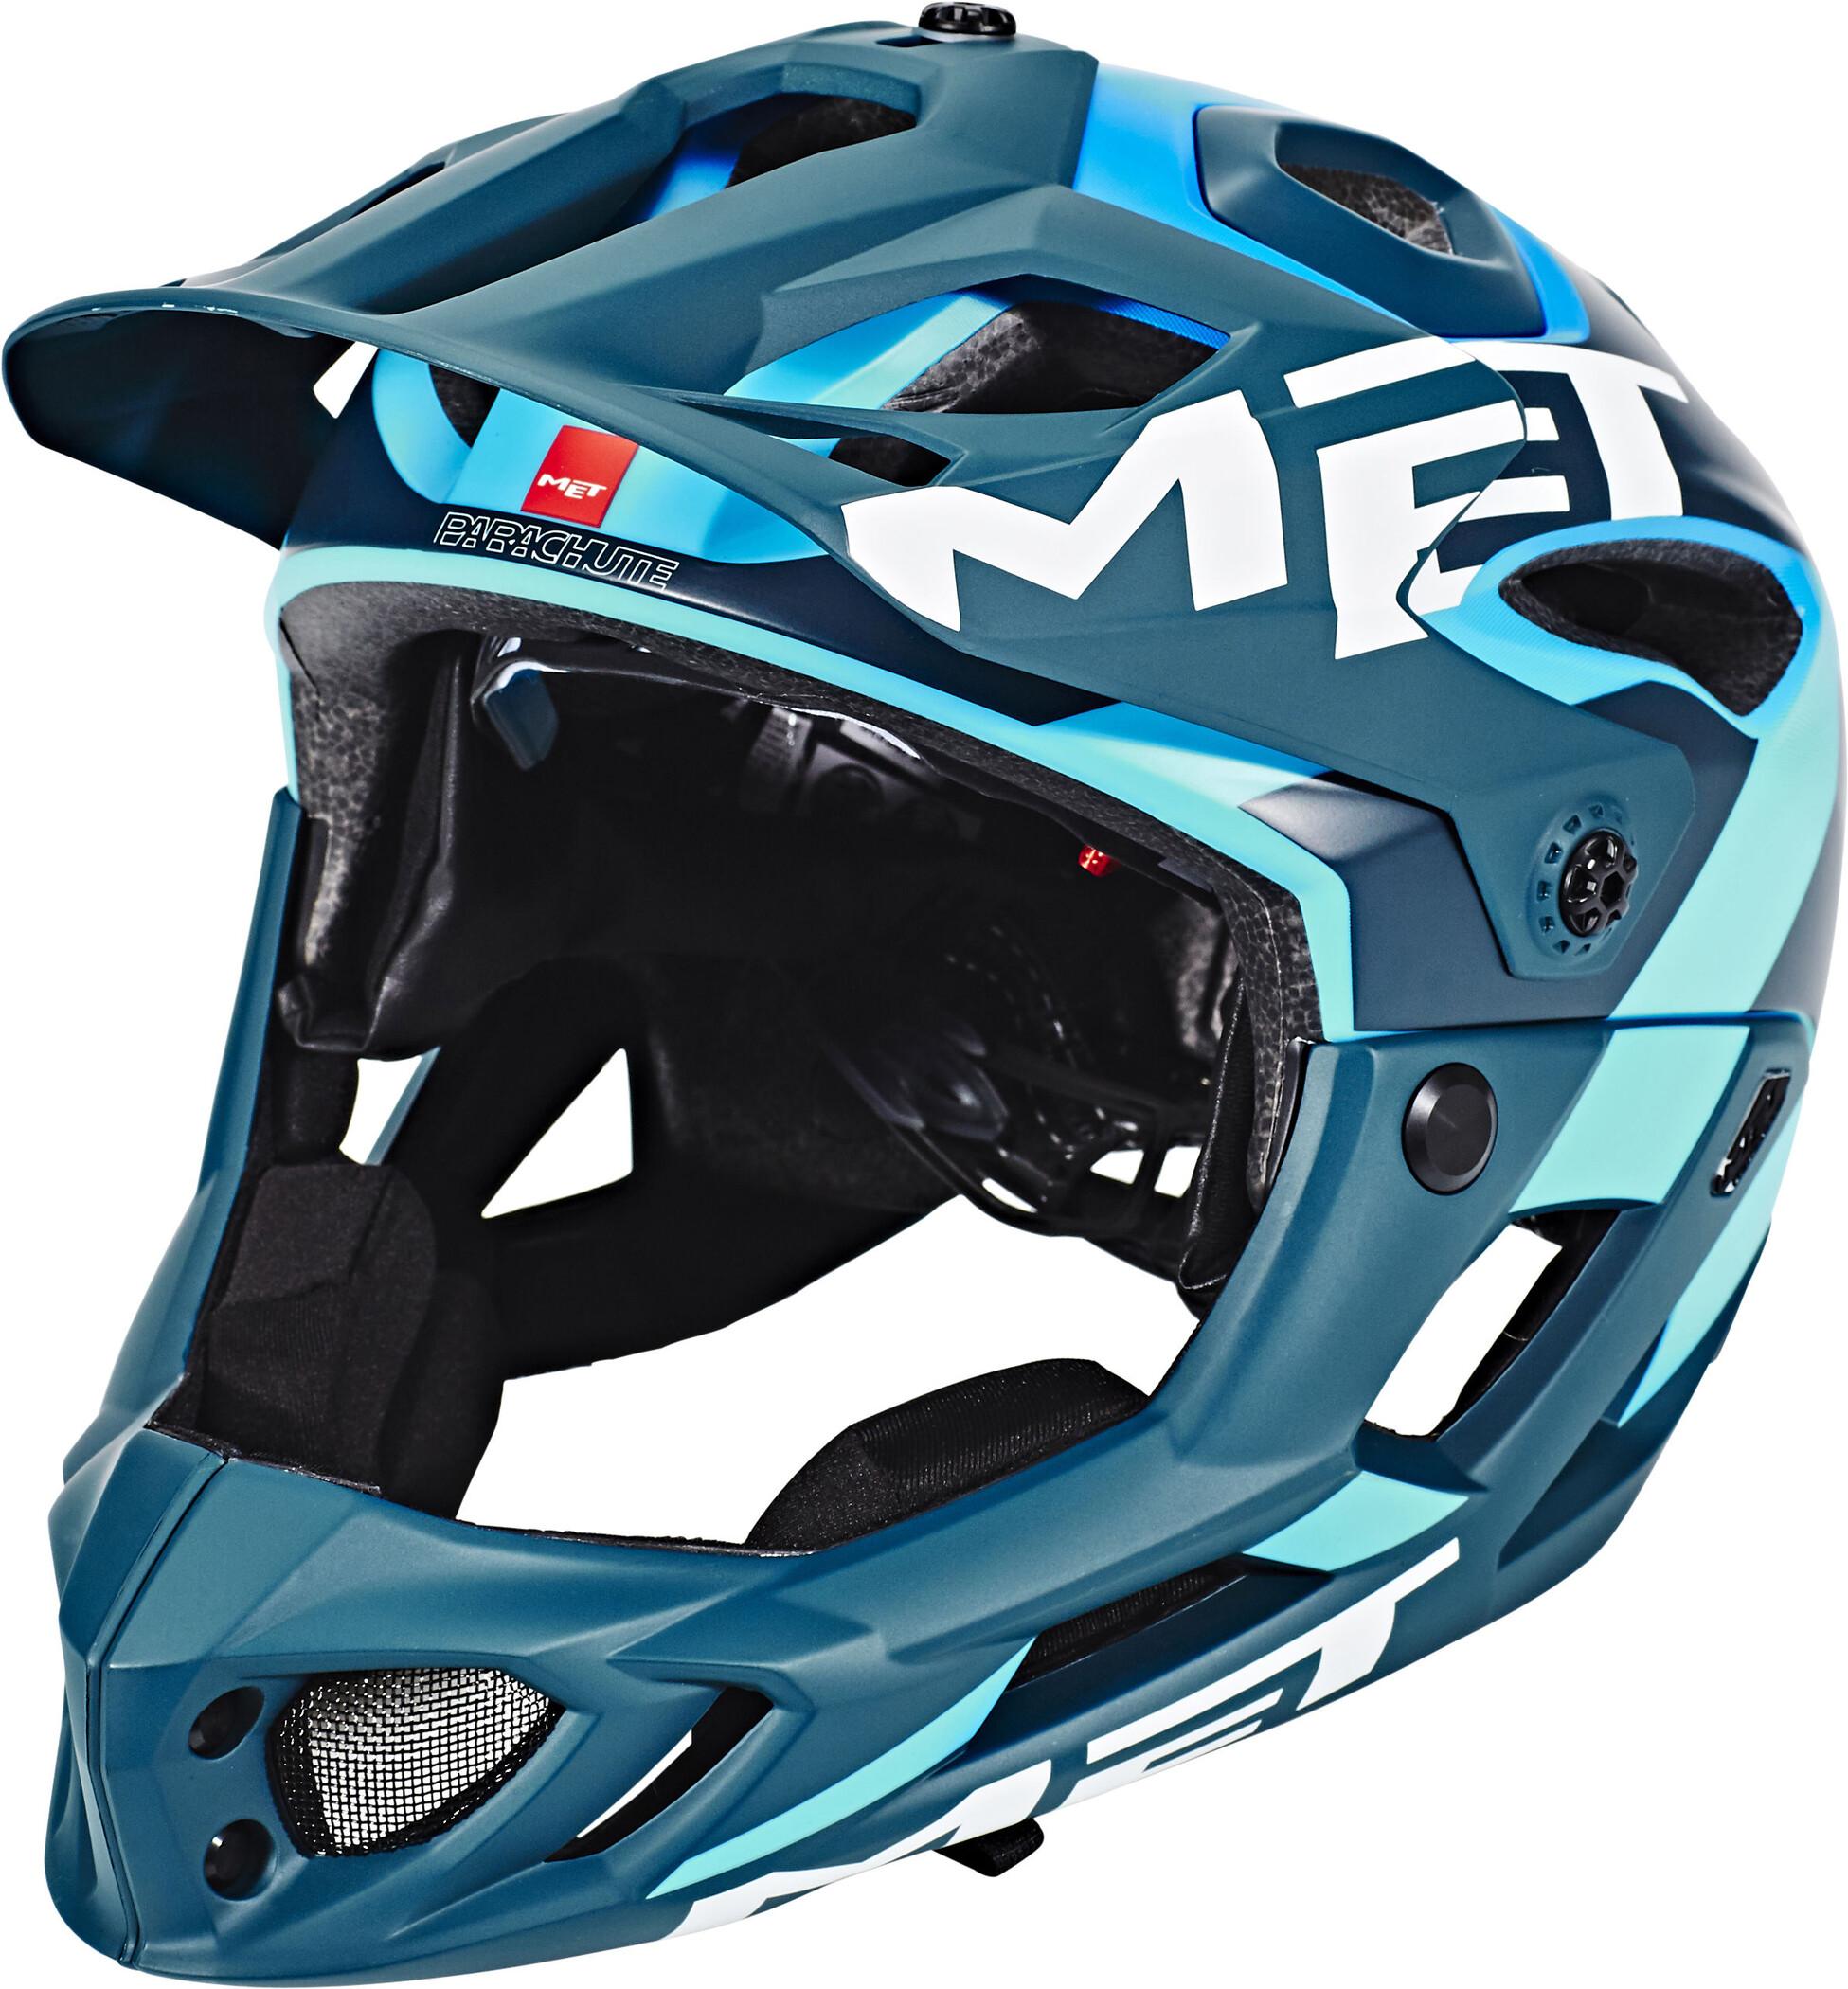 MET Parachute Cykelhjelm, blue/cyan (2019) | Helmets